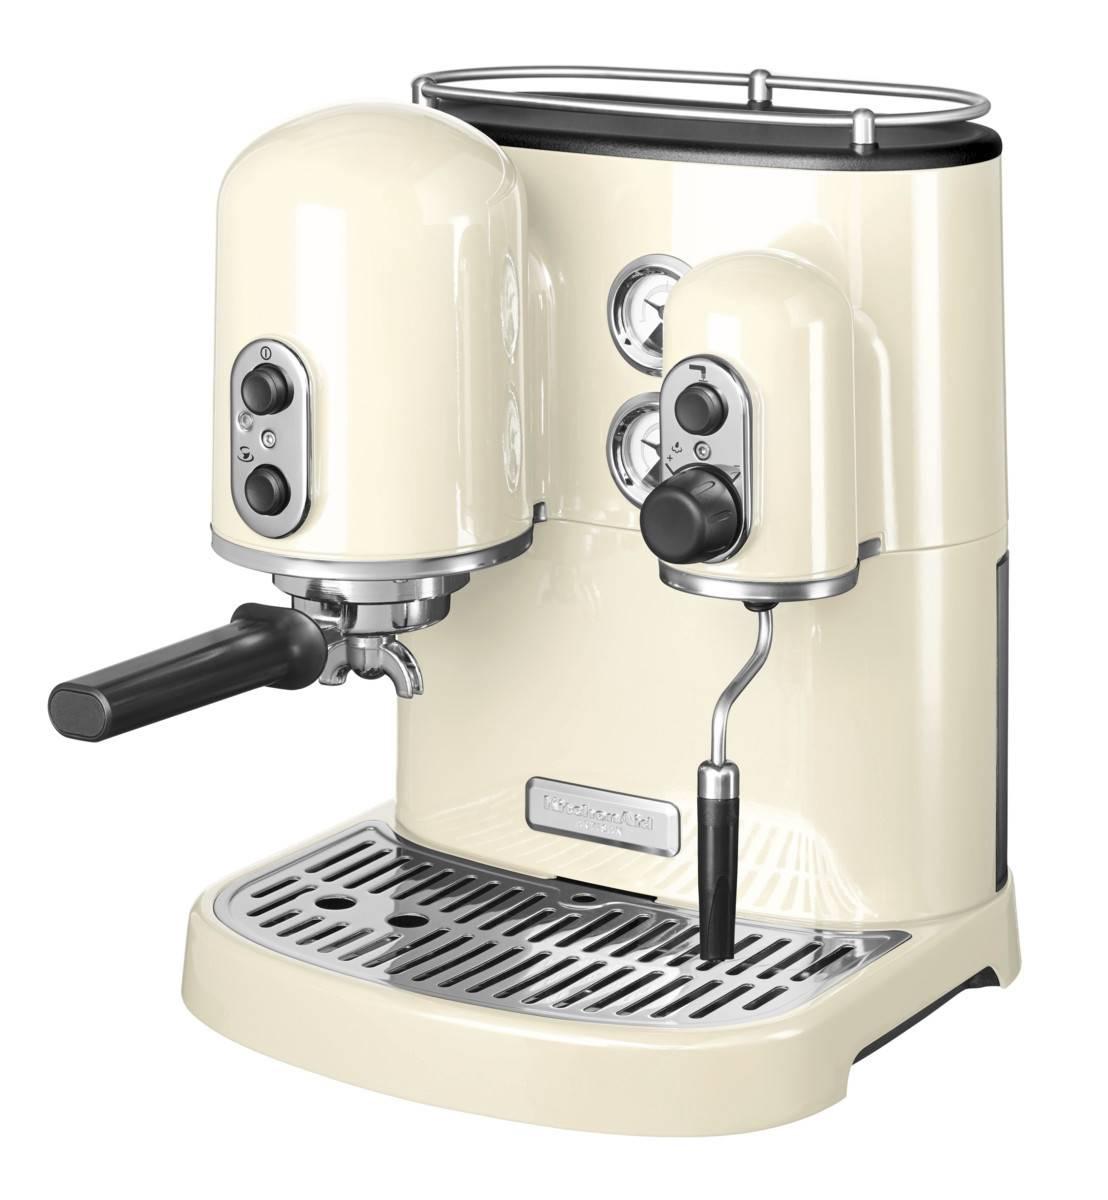 Kitchenaid 5kes2102bac Artisan Espresso Coffee Machine Almond Cream